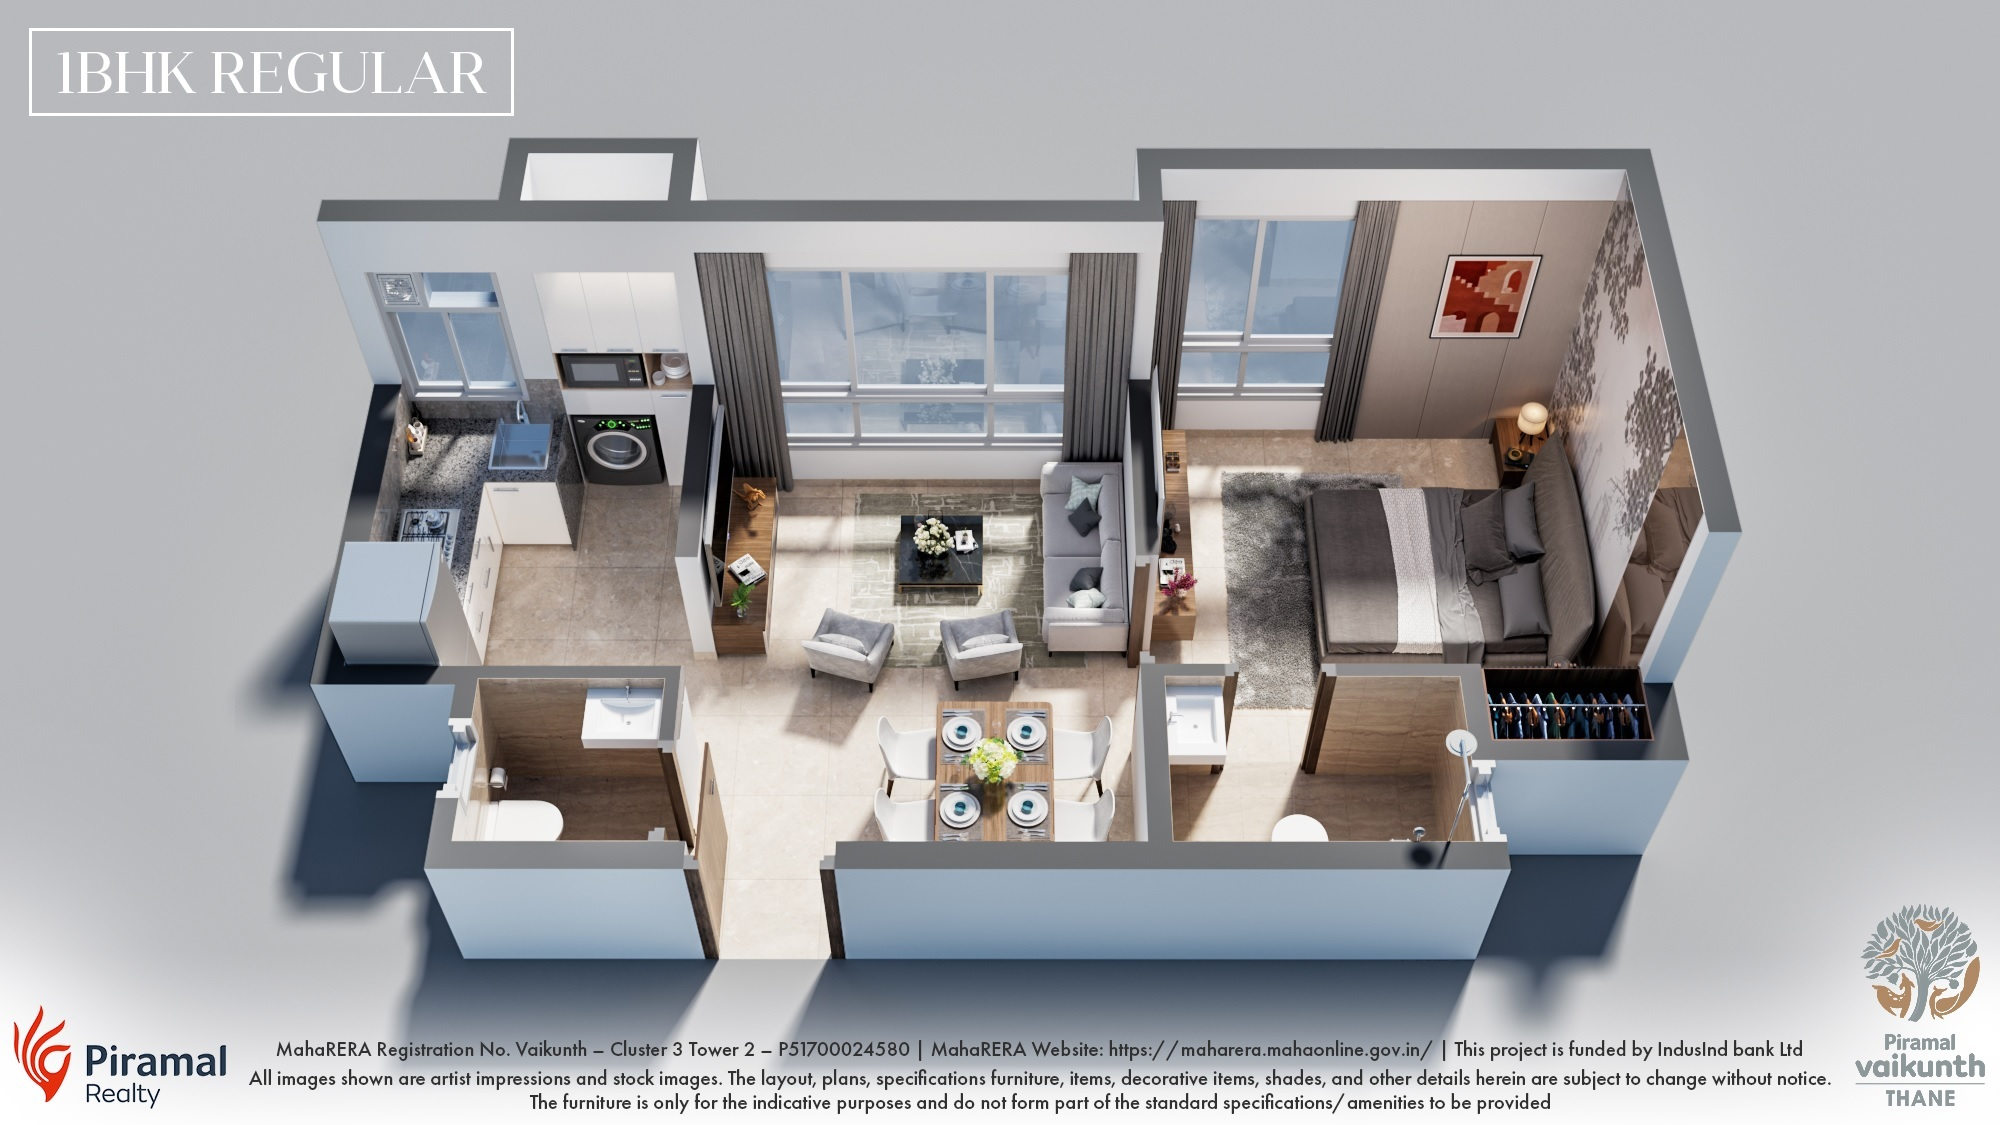 piramal vaikunth apartment 1 bhk 371sqft 20203606183610